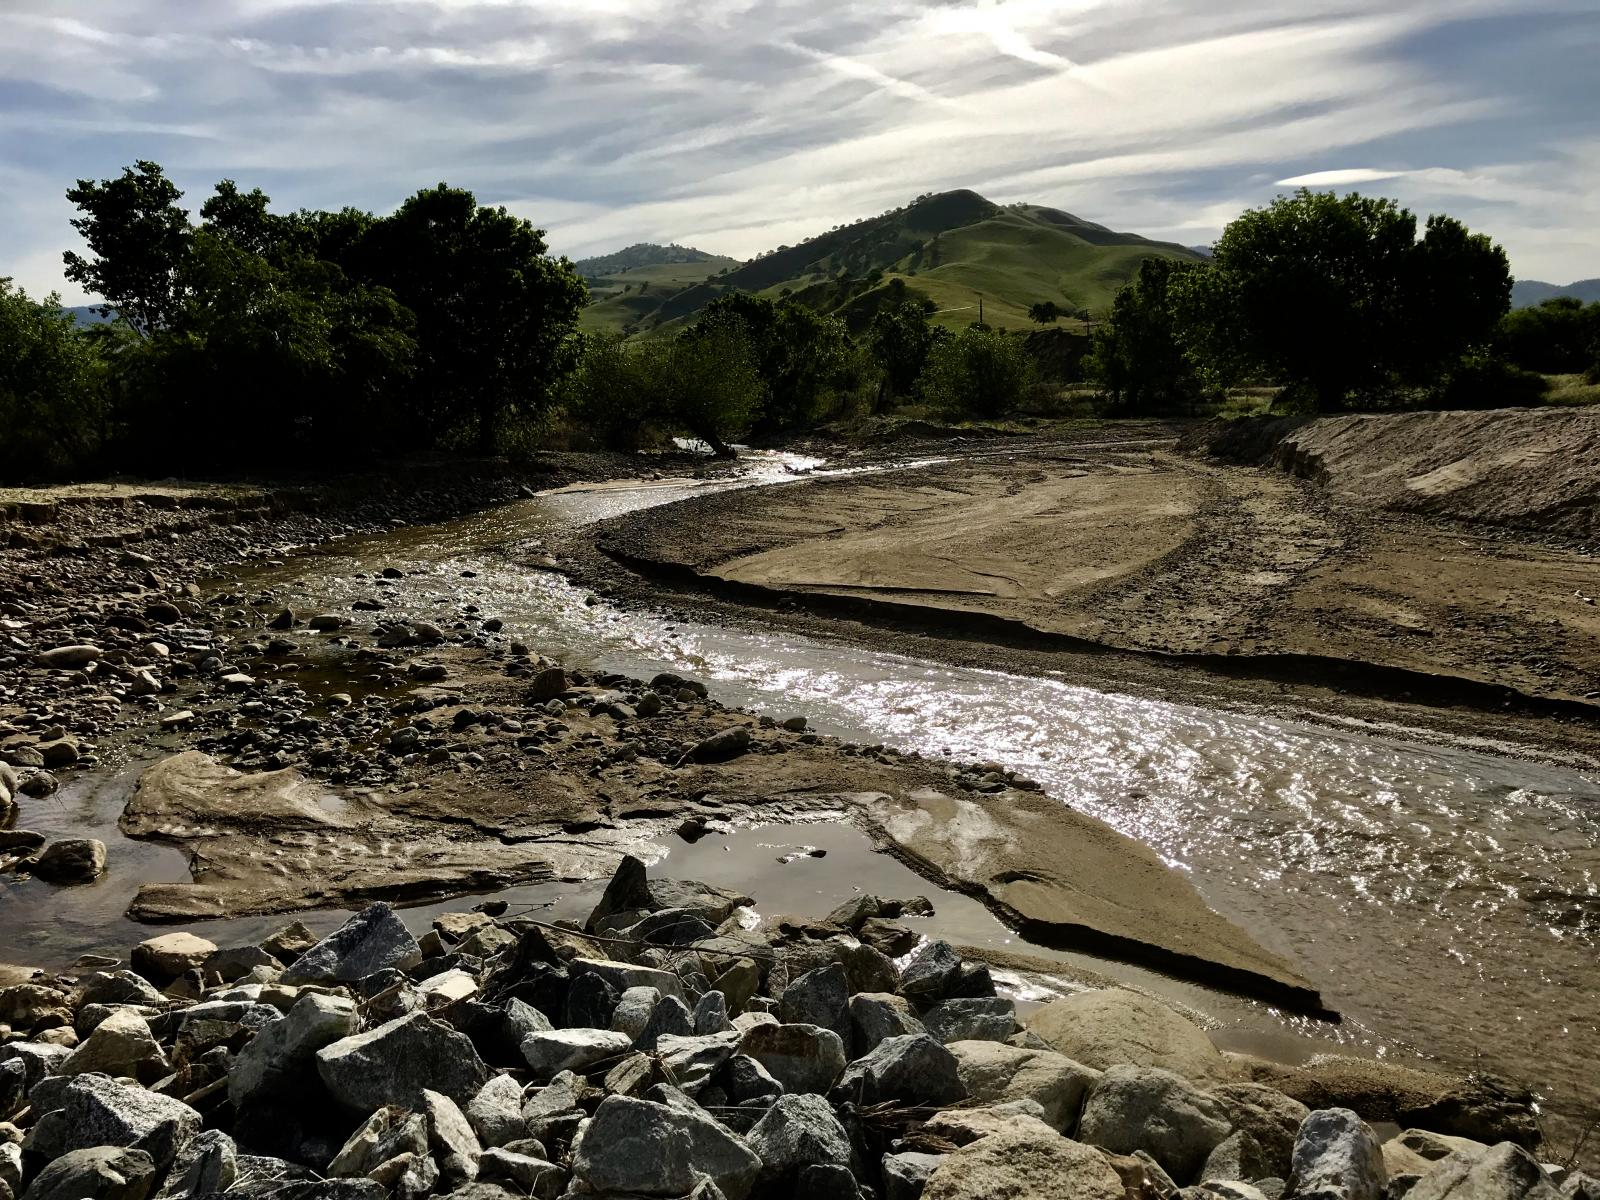 Caliente creek